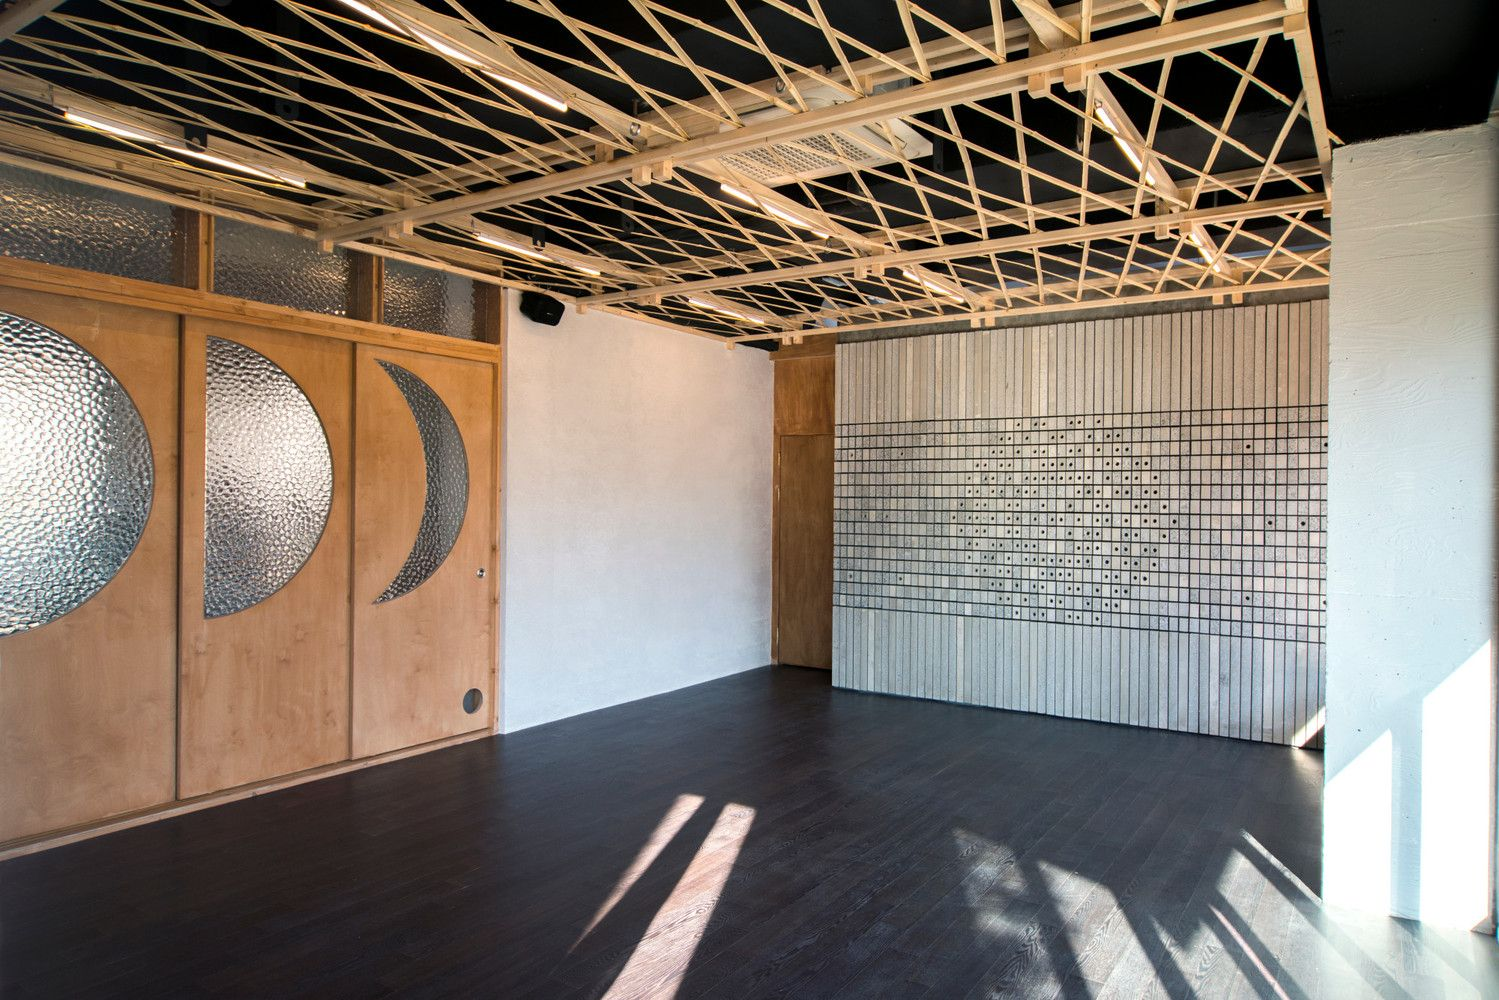 Gallery of Irim Yoga Studio & Cafe / Foam Architects  - 4